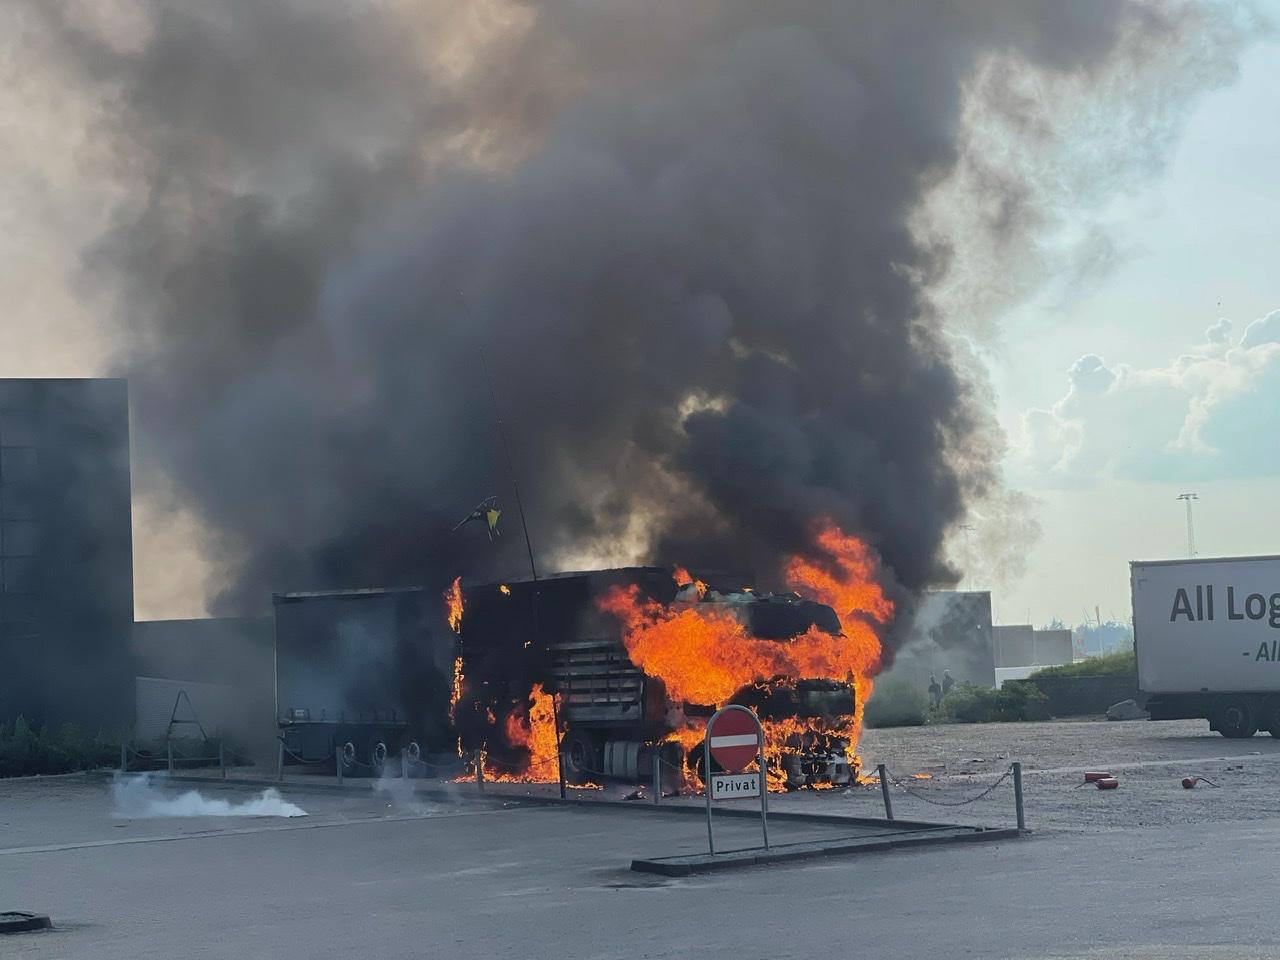 Voldsom brand i udenlandsk lastbil